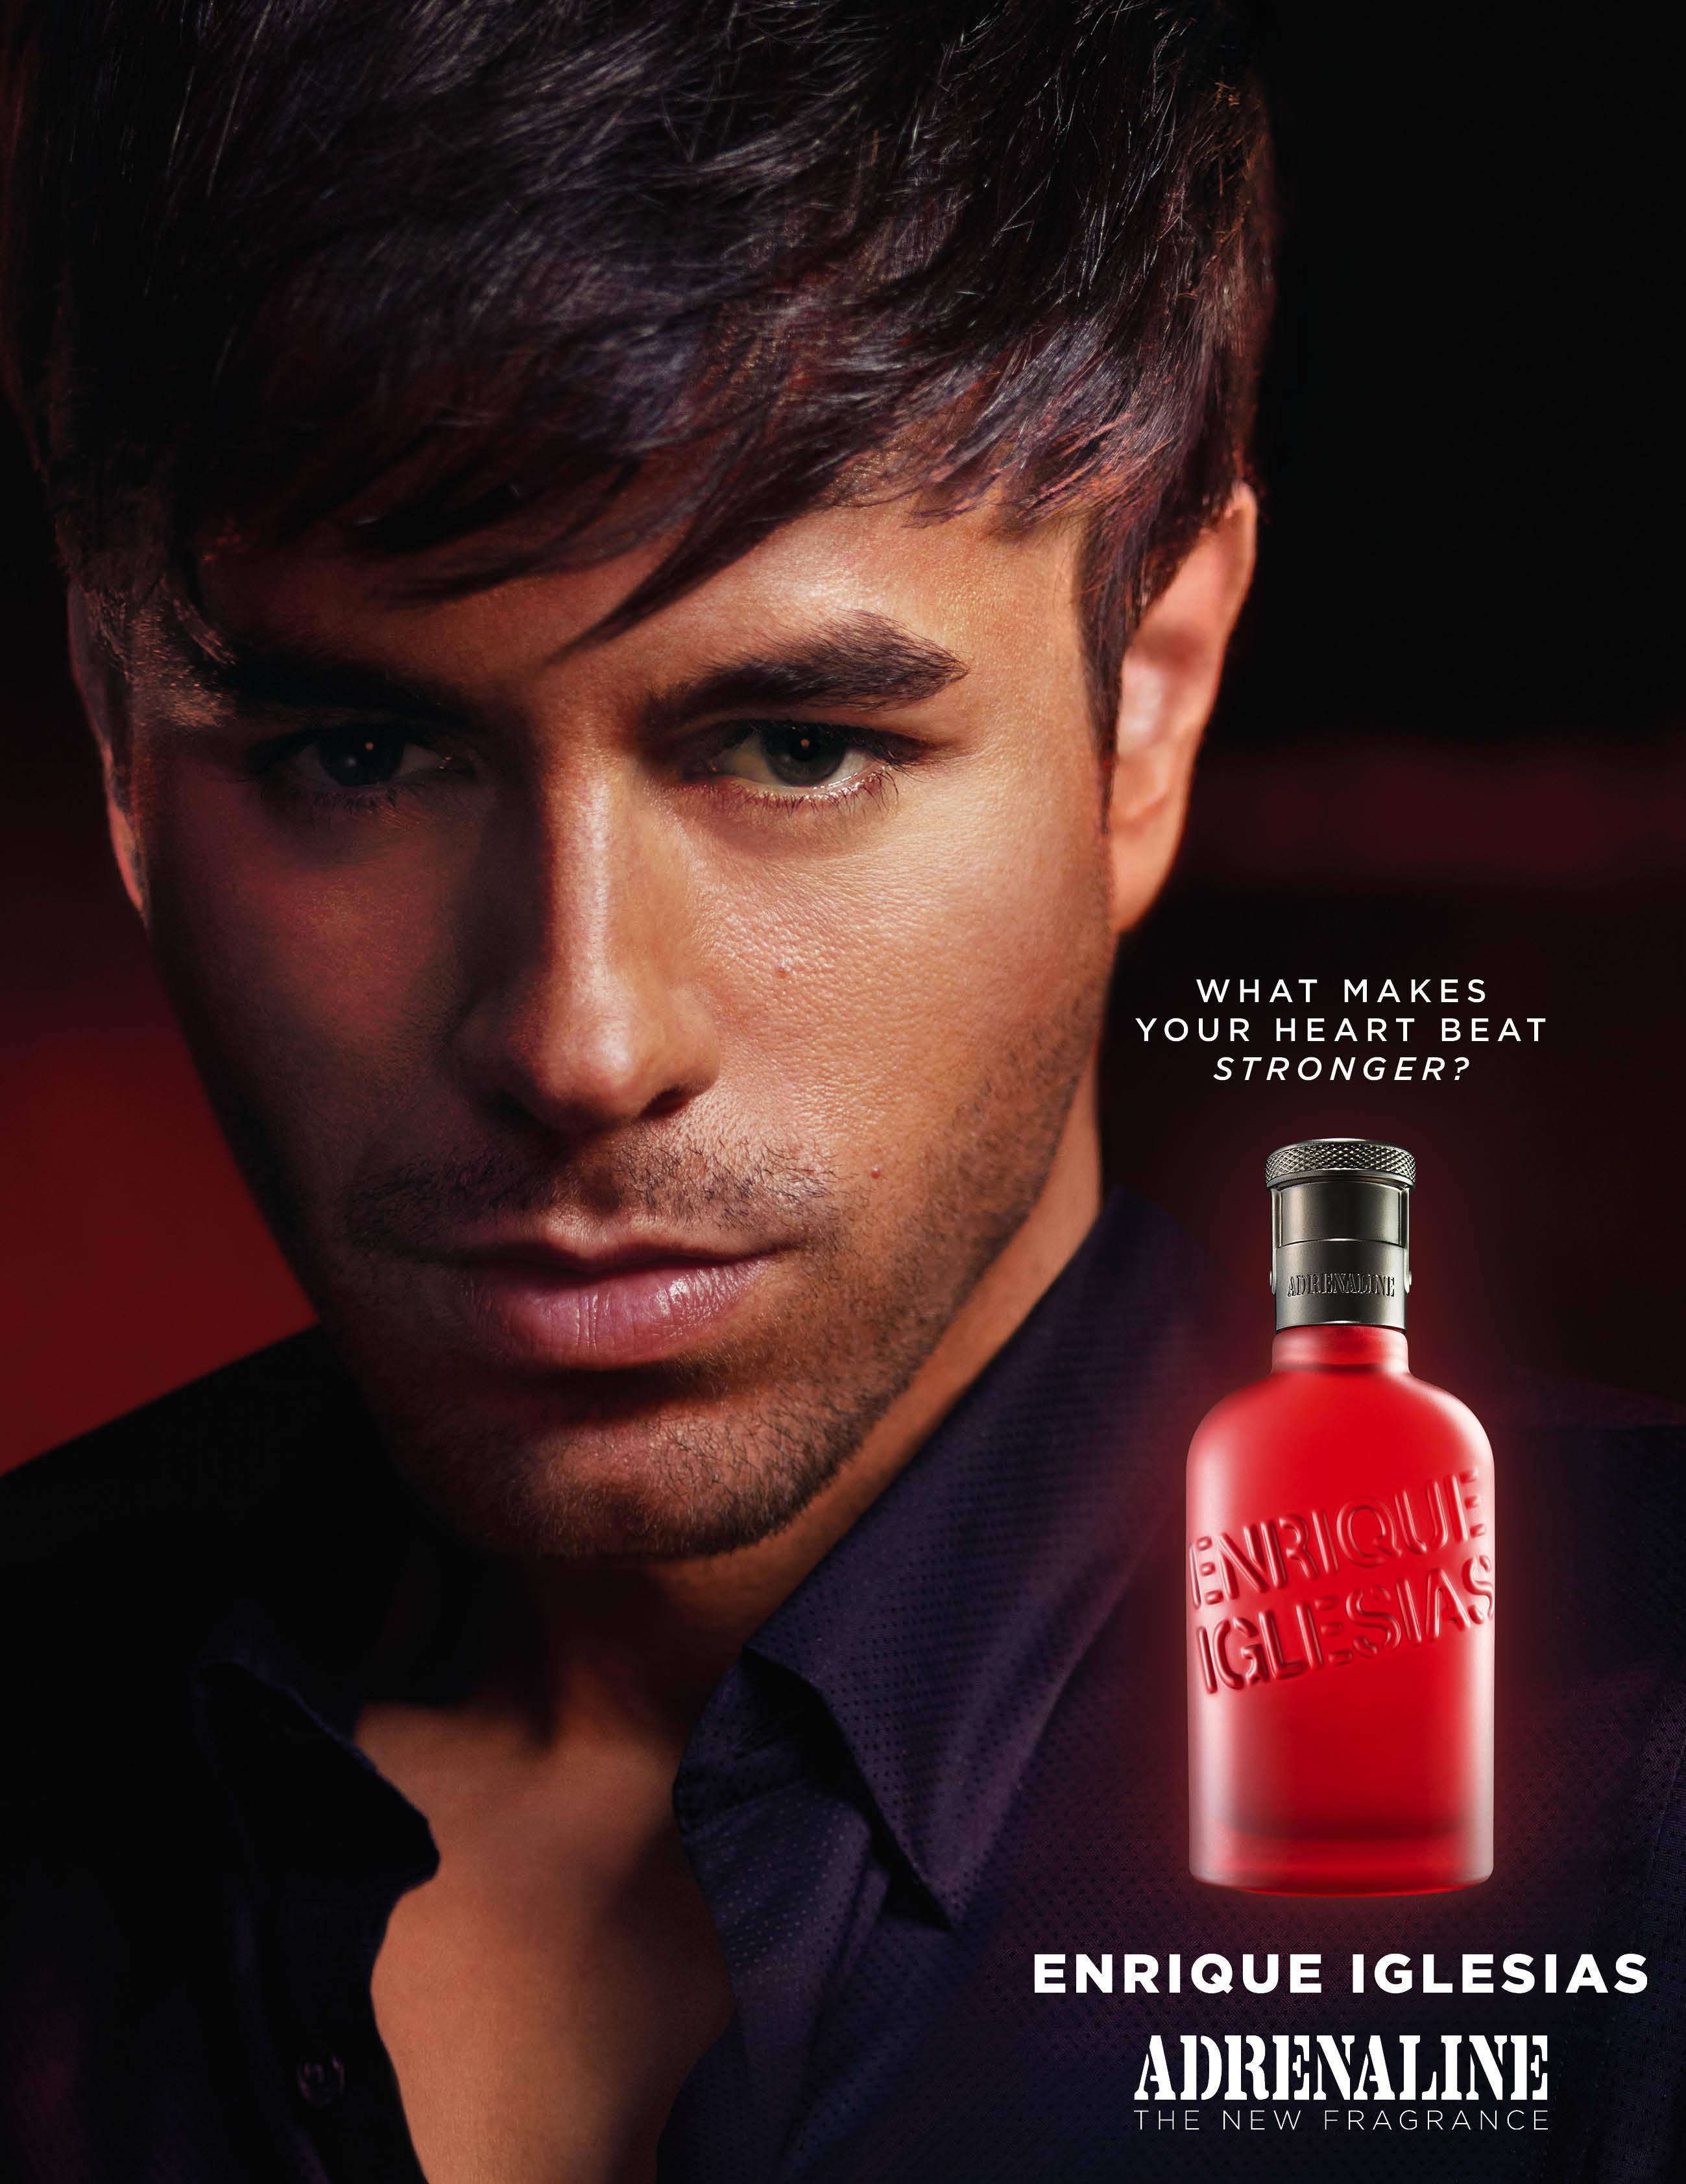 Adrenaline Enrique Iglesias Cologne A Fragrance For Men 2014